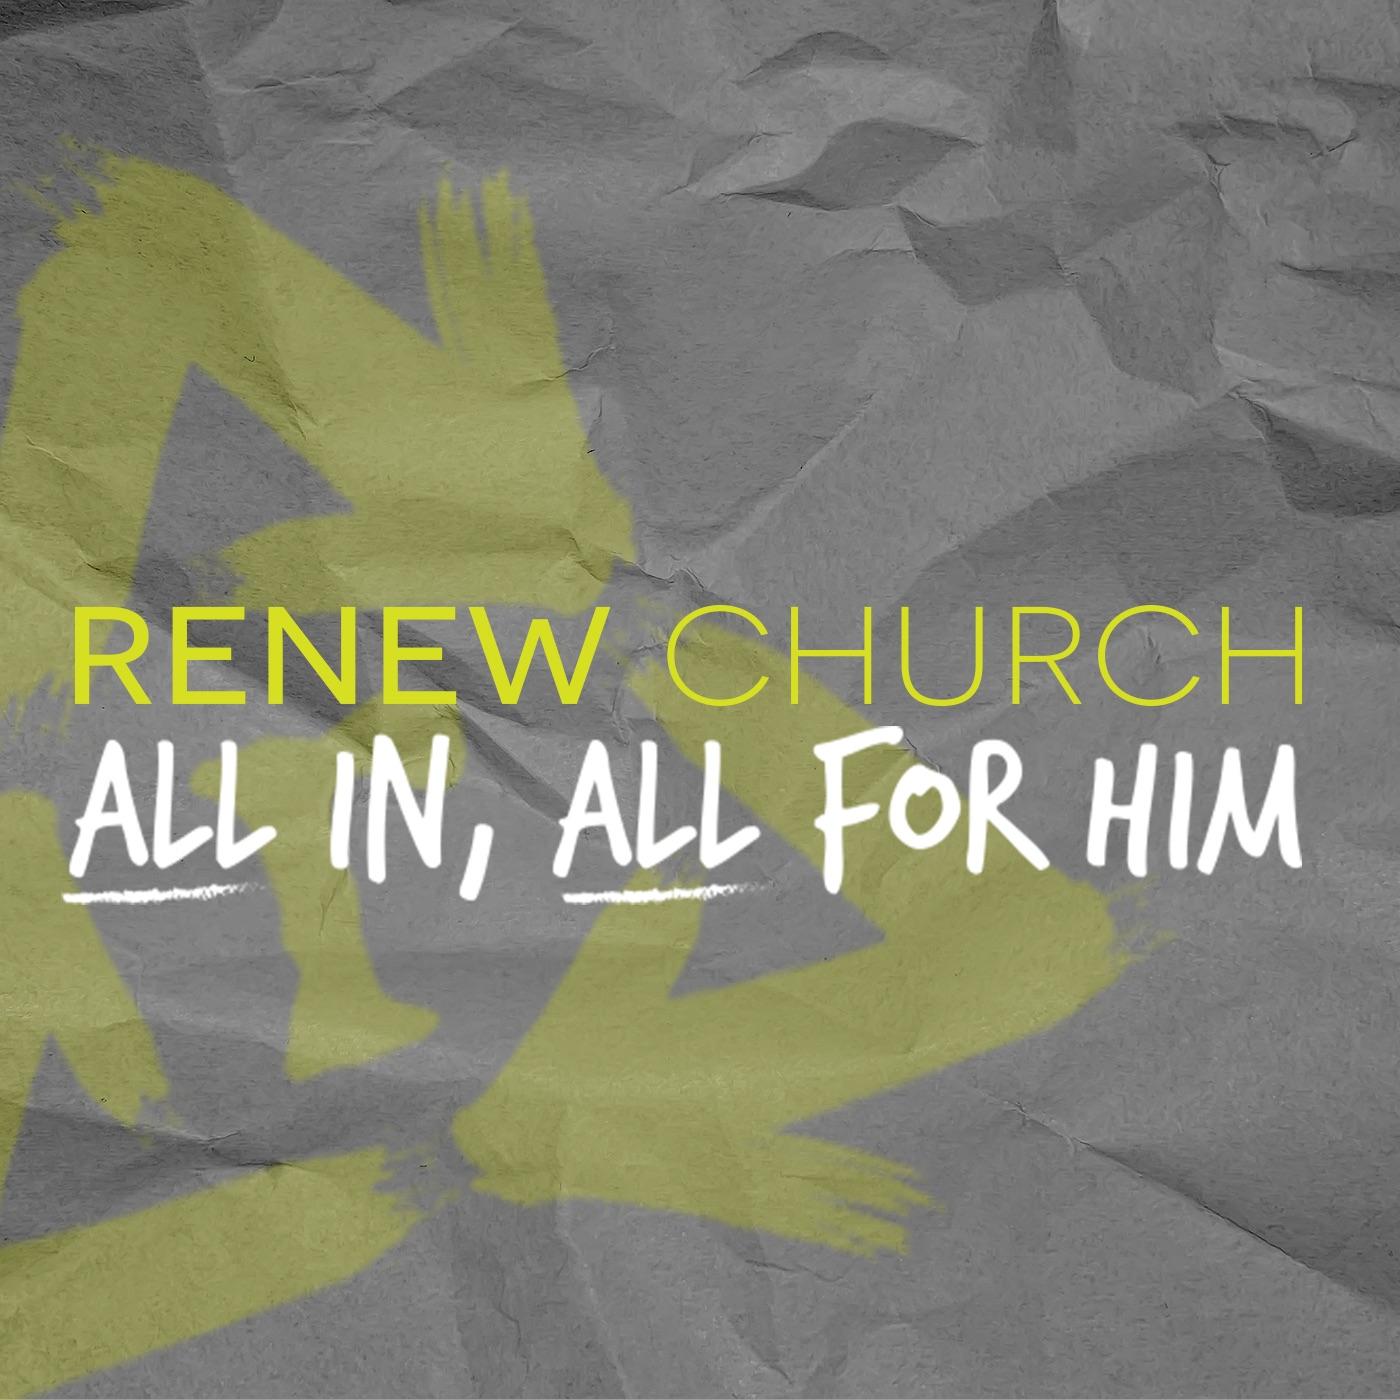 Renew Church